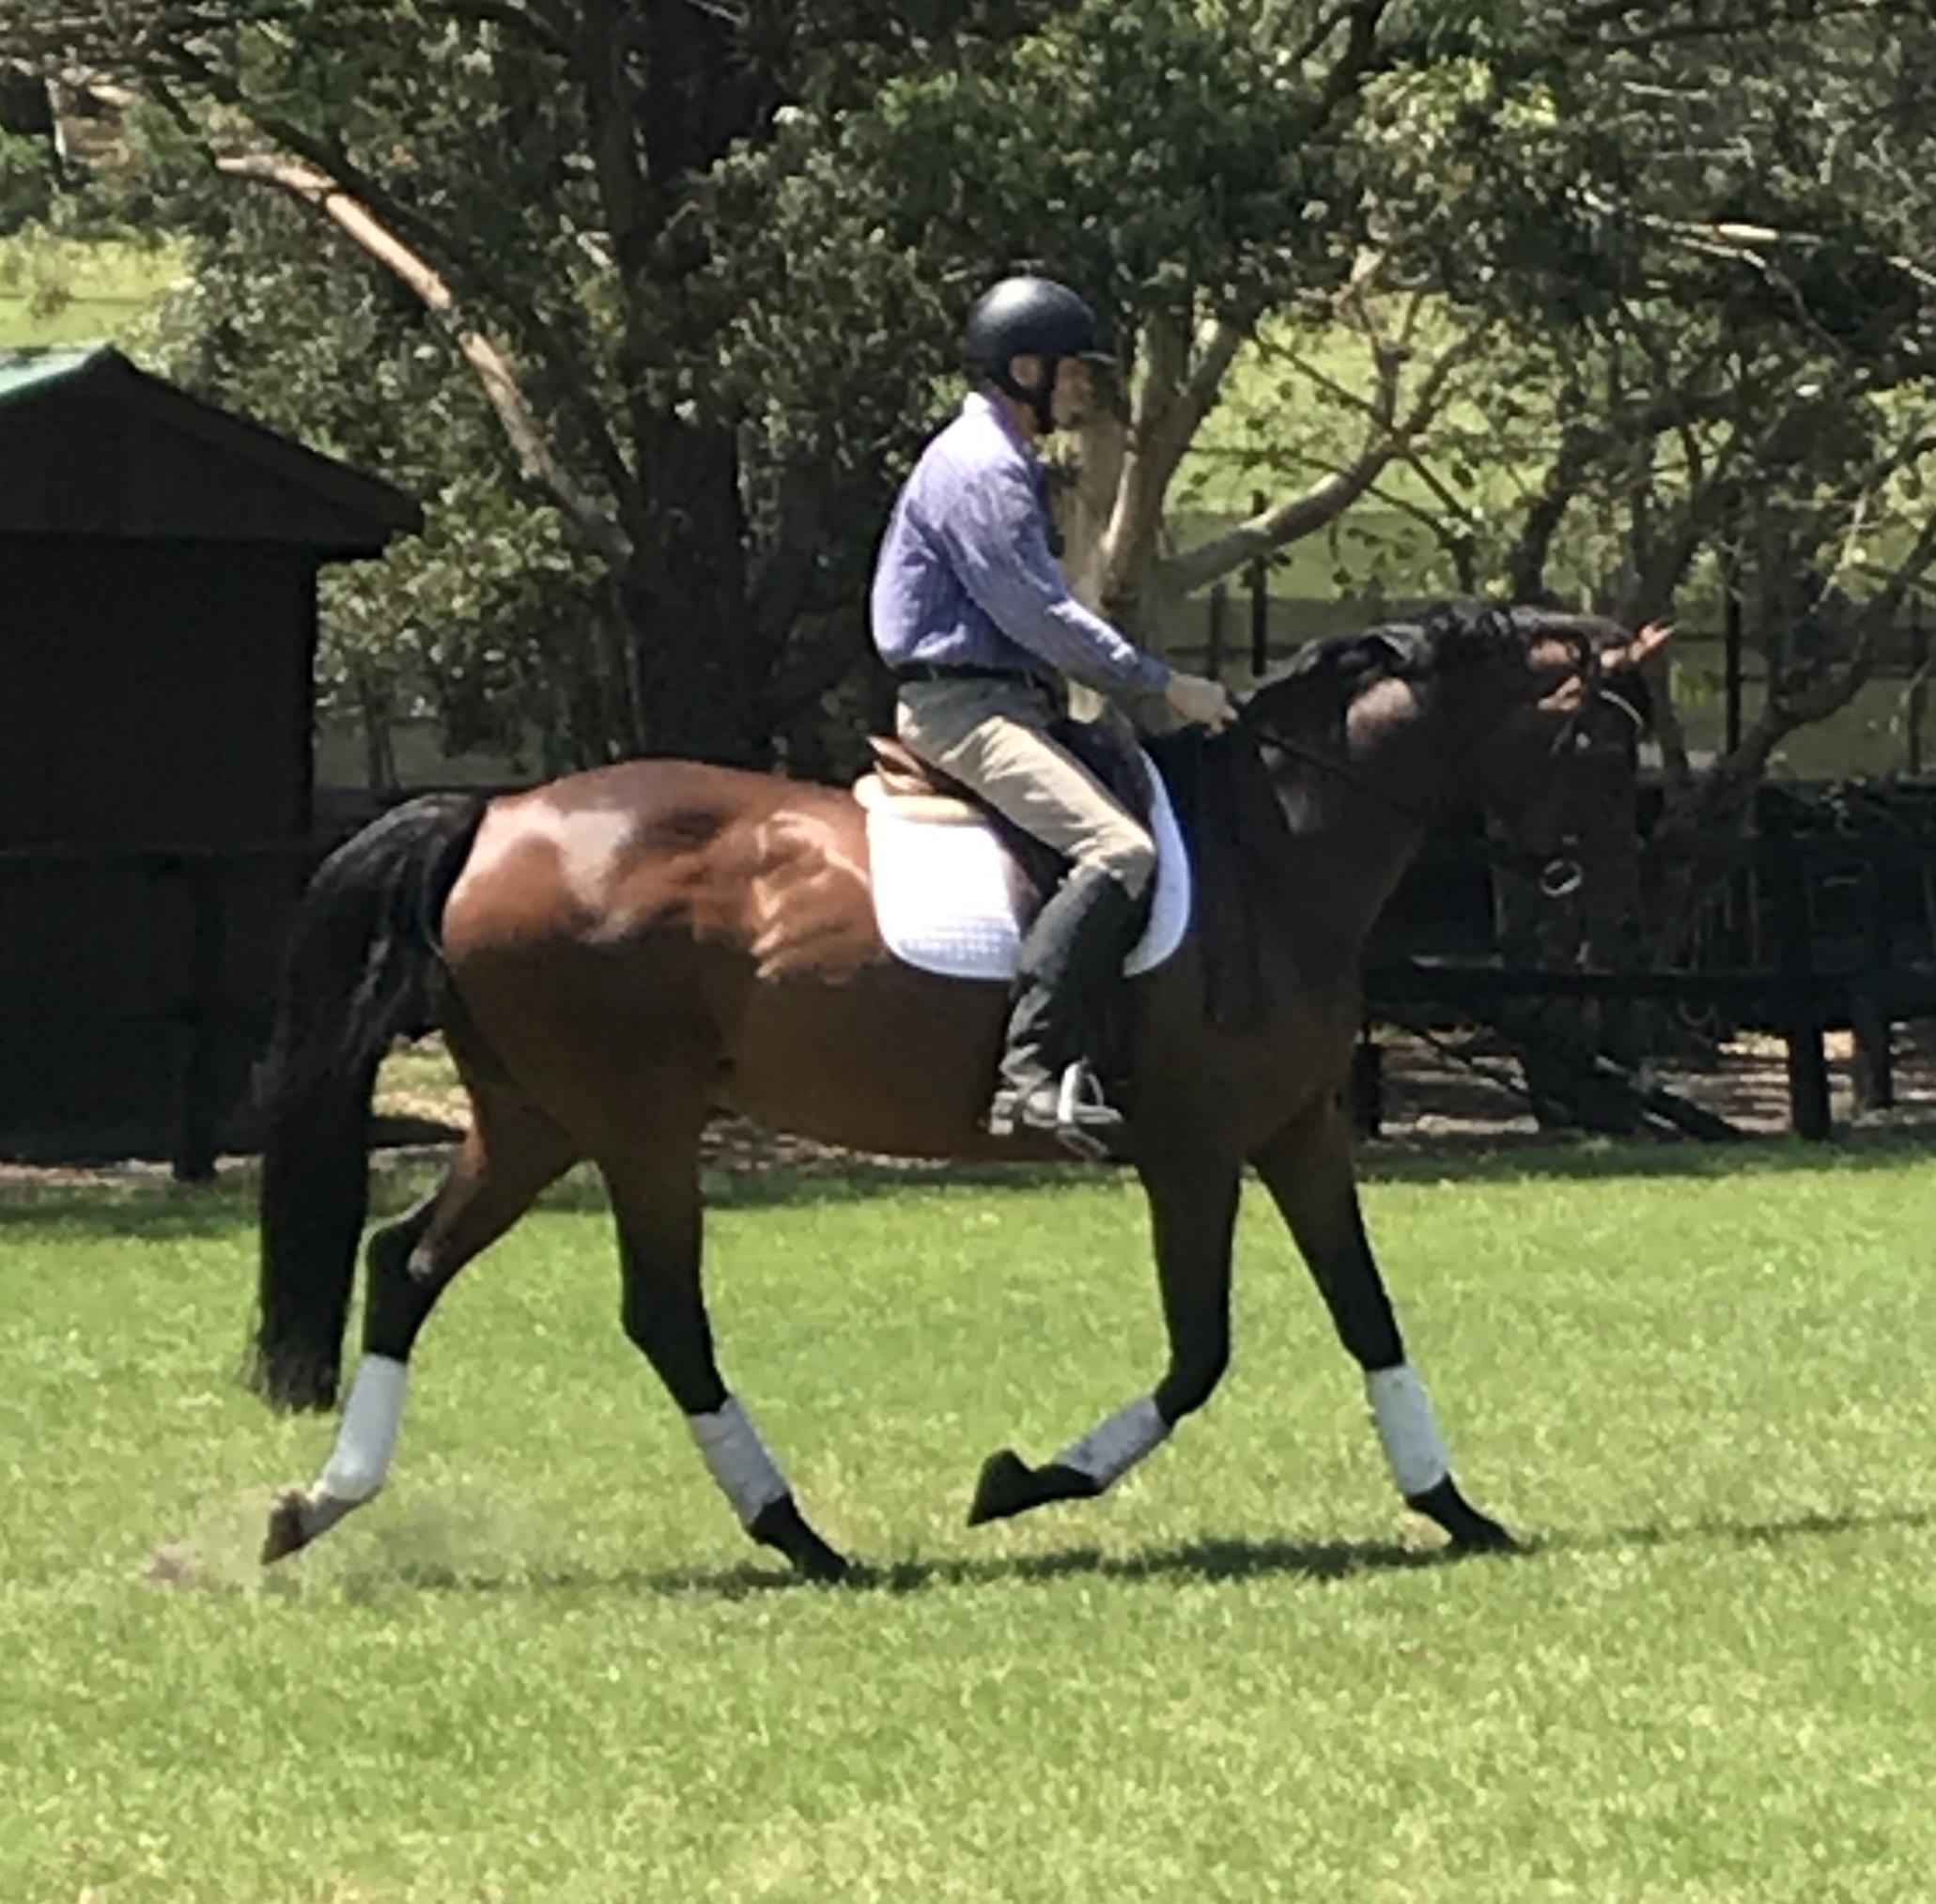 Stunning Broodmare or Riding Horse